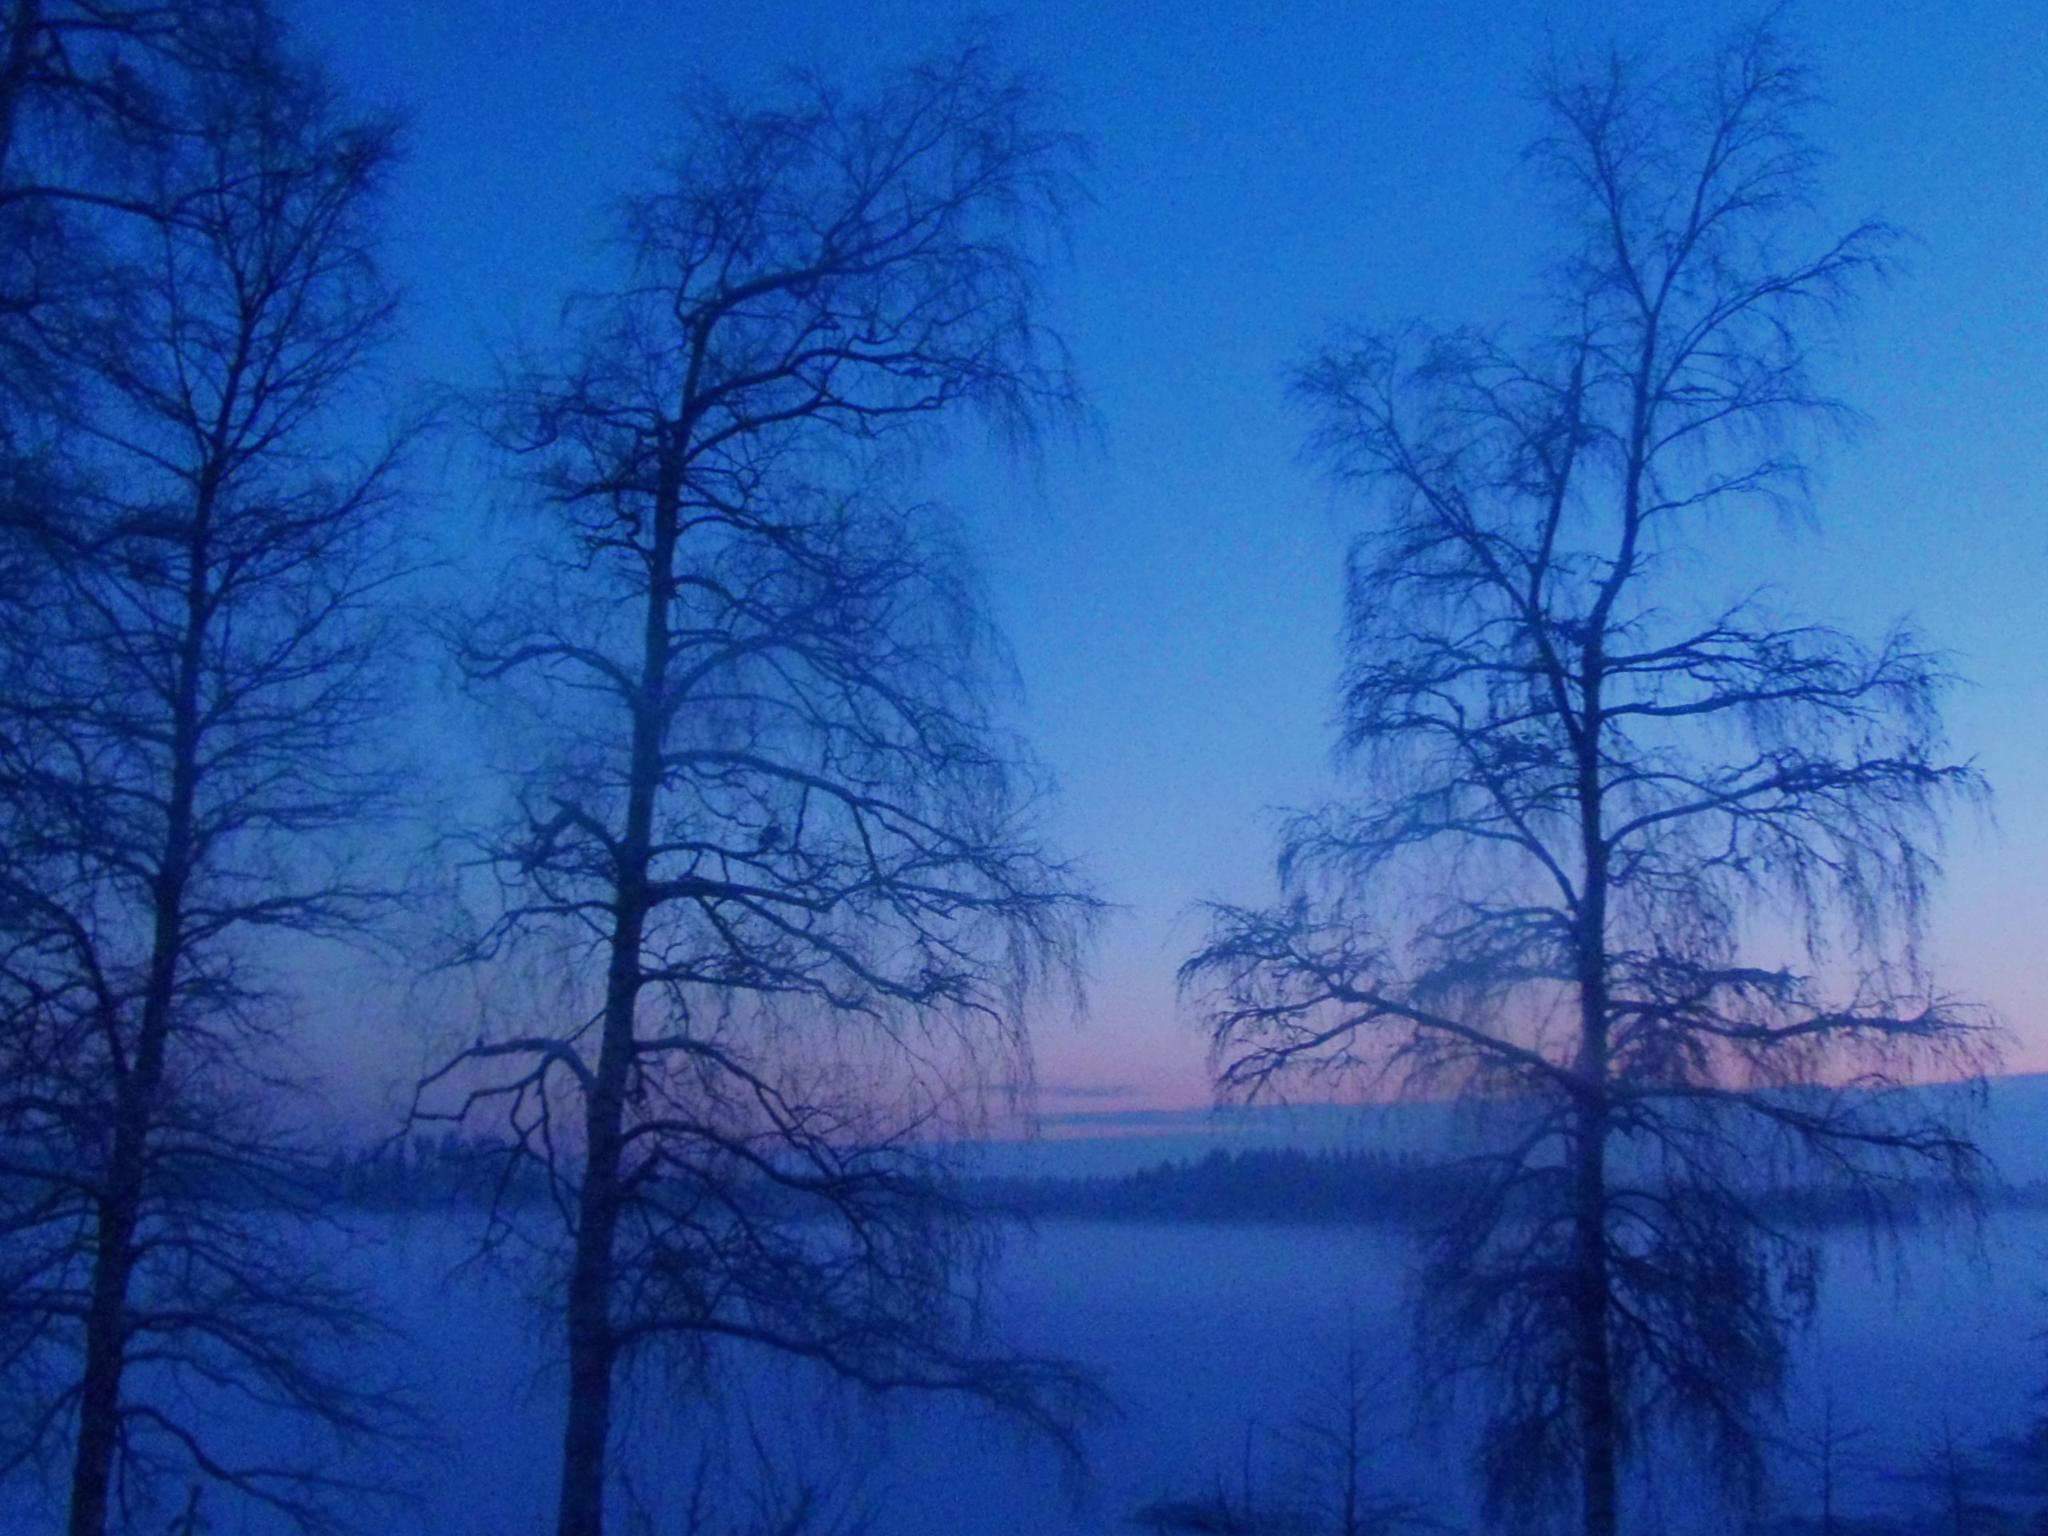 Blue moment - lake haze - sunset - sininen hetki by laura.kamil